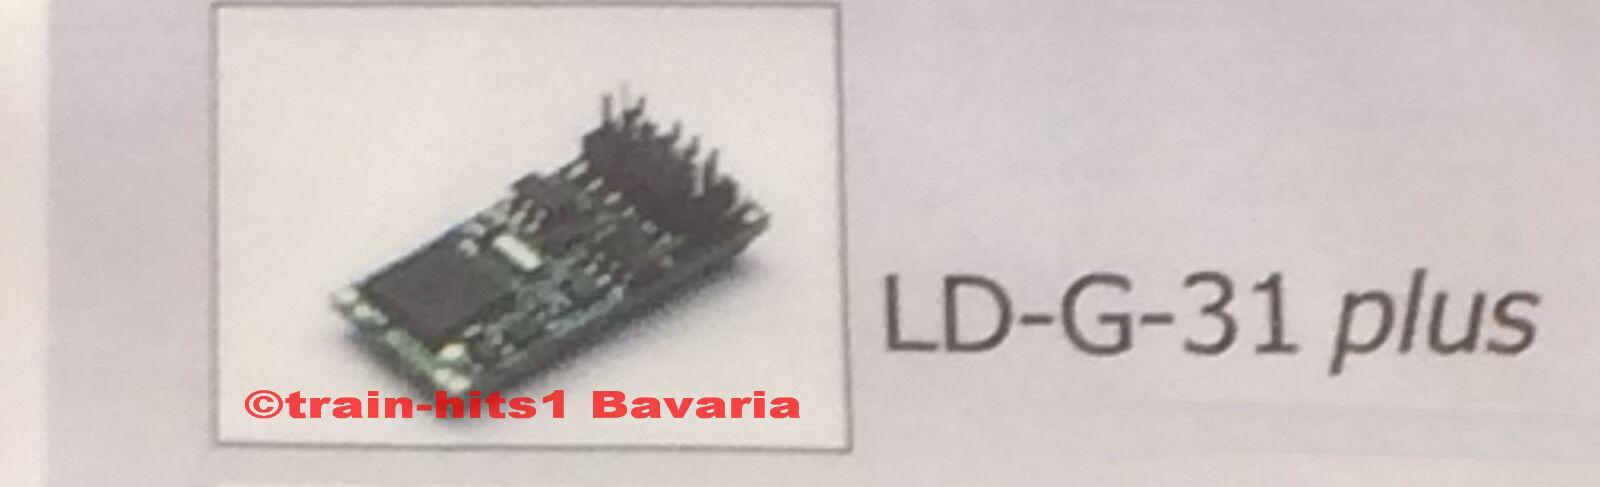 Tams h0 tutti i tipi Lokdecoder Lokdecoder Lokdecoder ld-g-31 Plus per cc motore, DCC MM + ACCESSORI 5bc72a